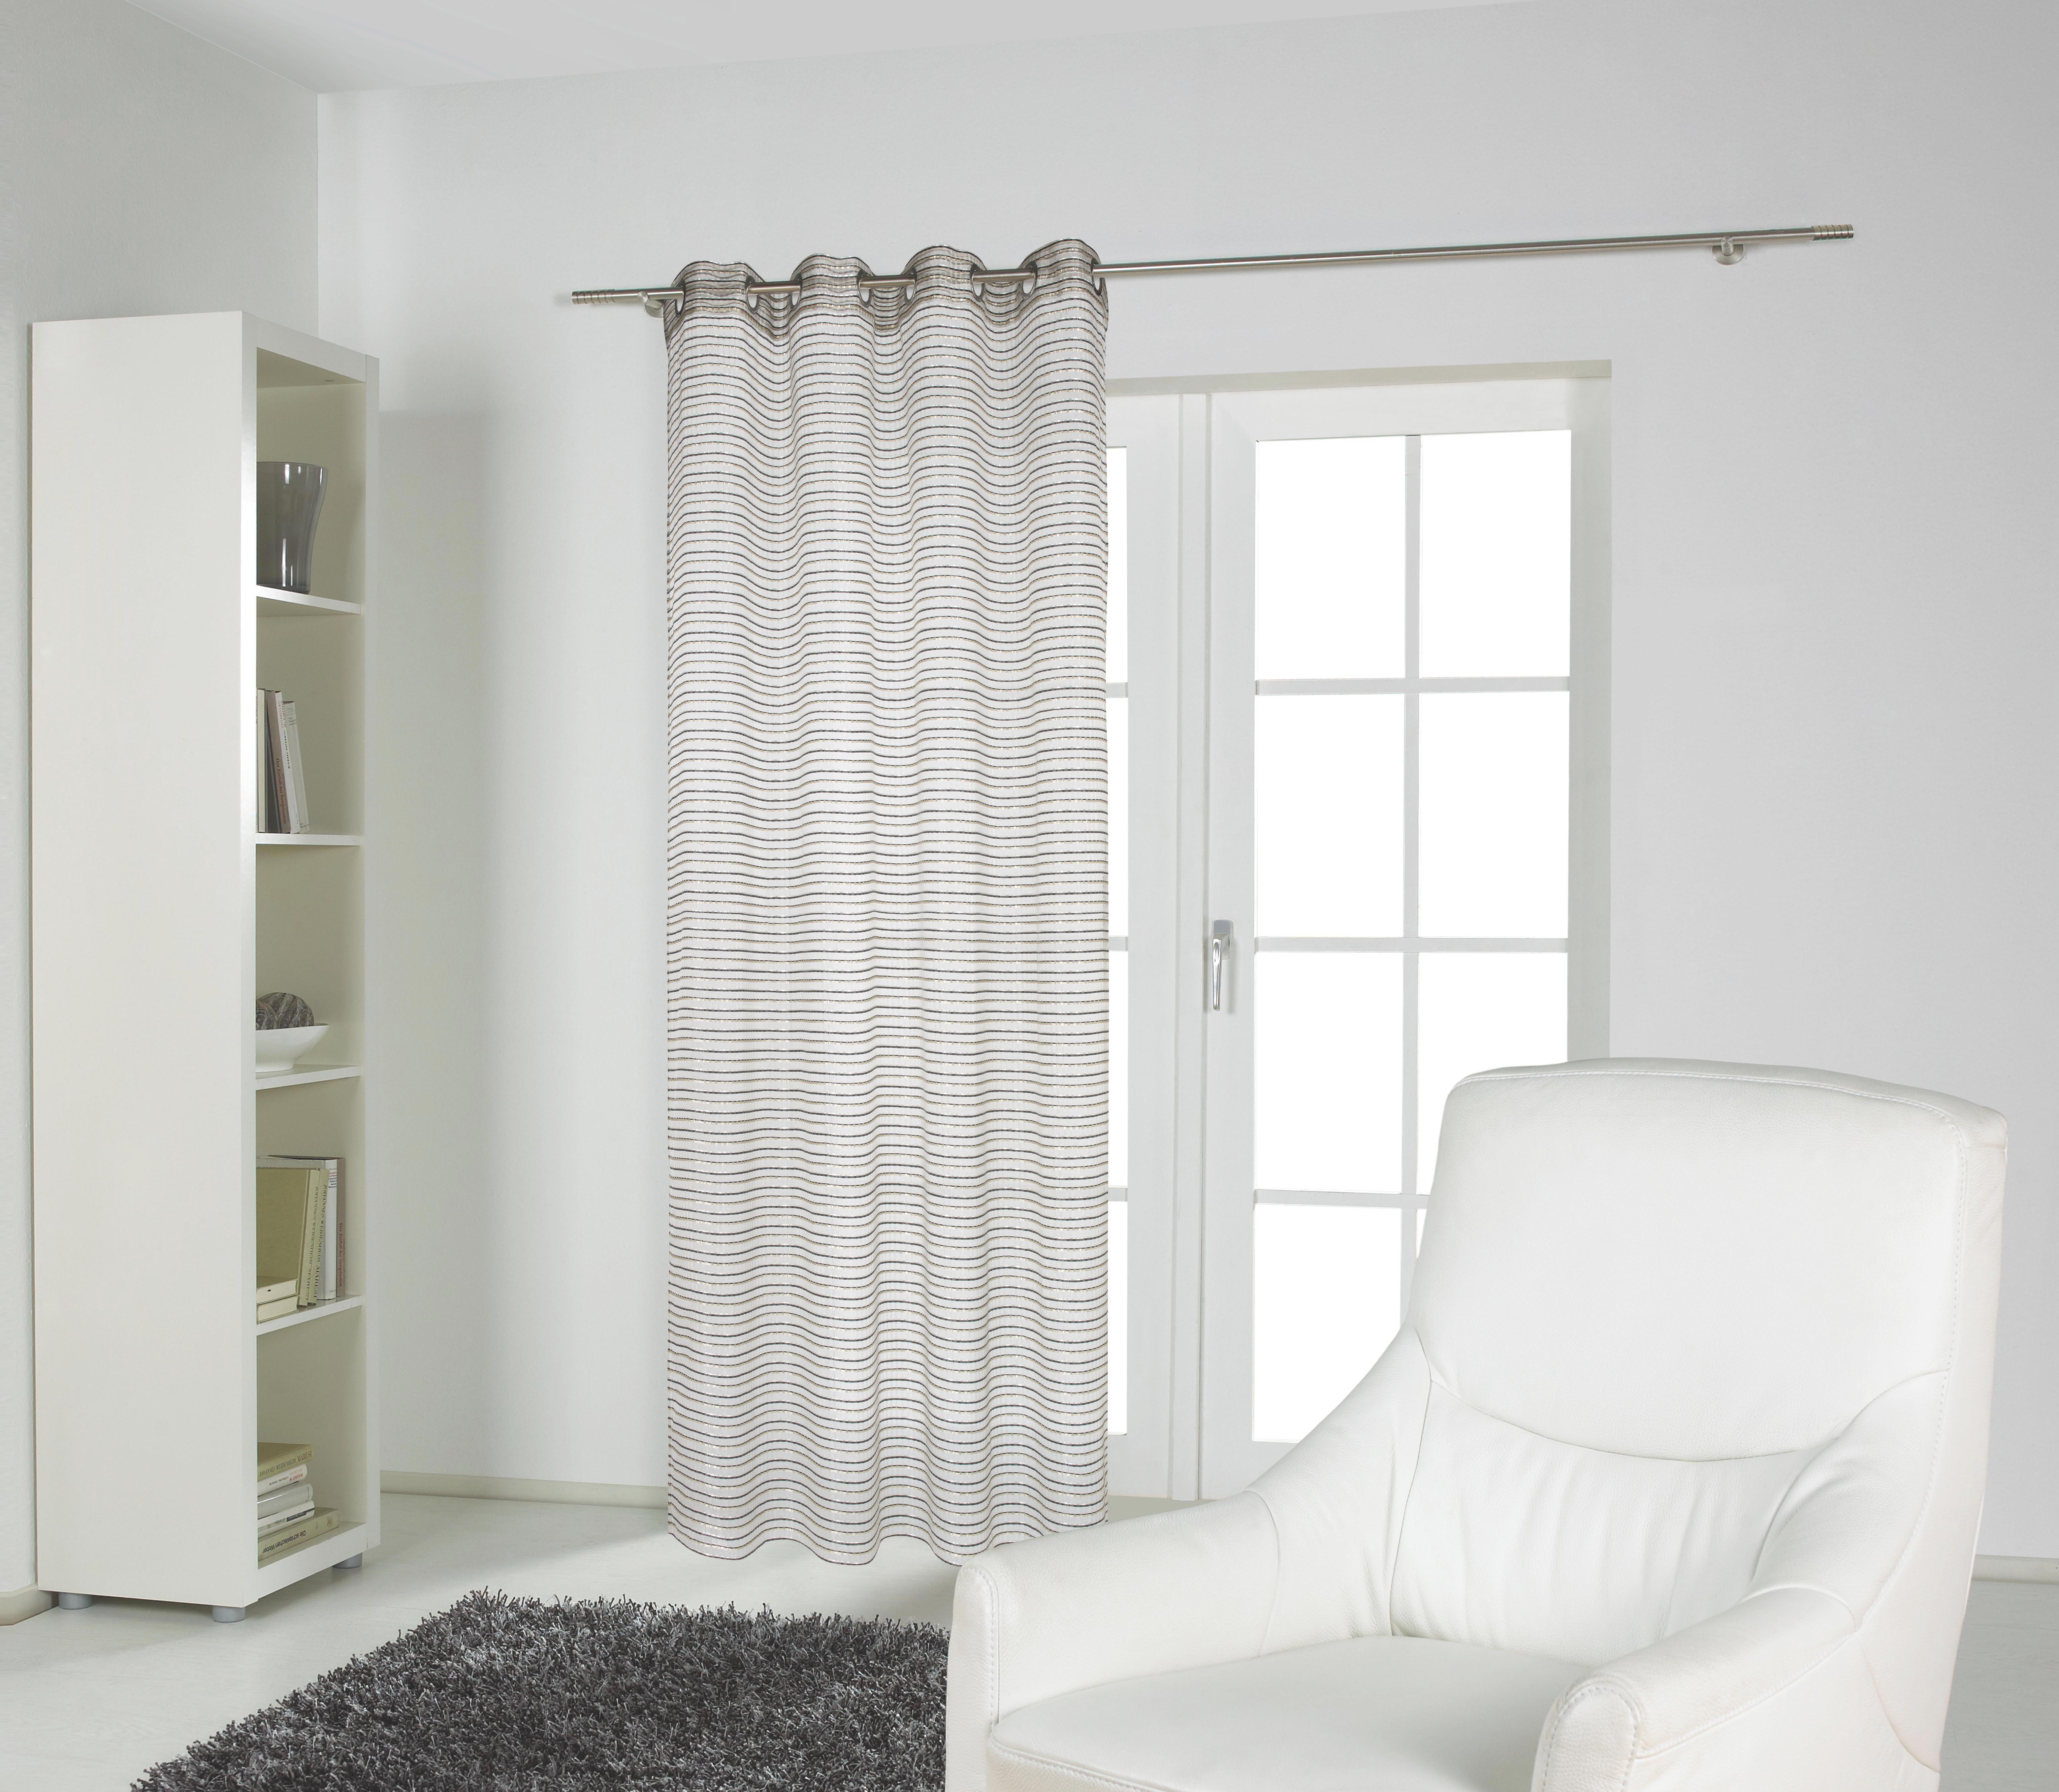 ÖSENSCHAL  transparent  140/235 cm - Silberfarben, Textil (140/235cm) - ESPOSA